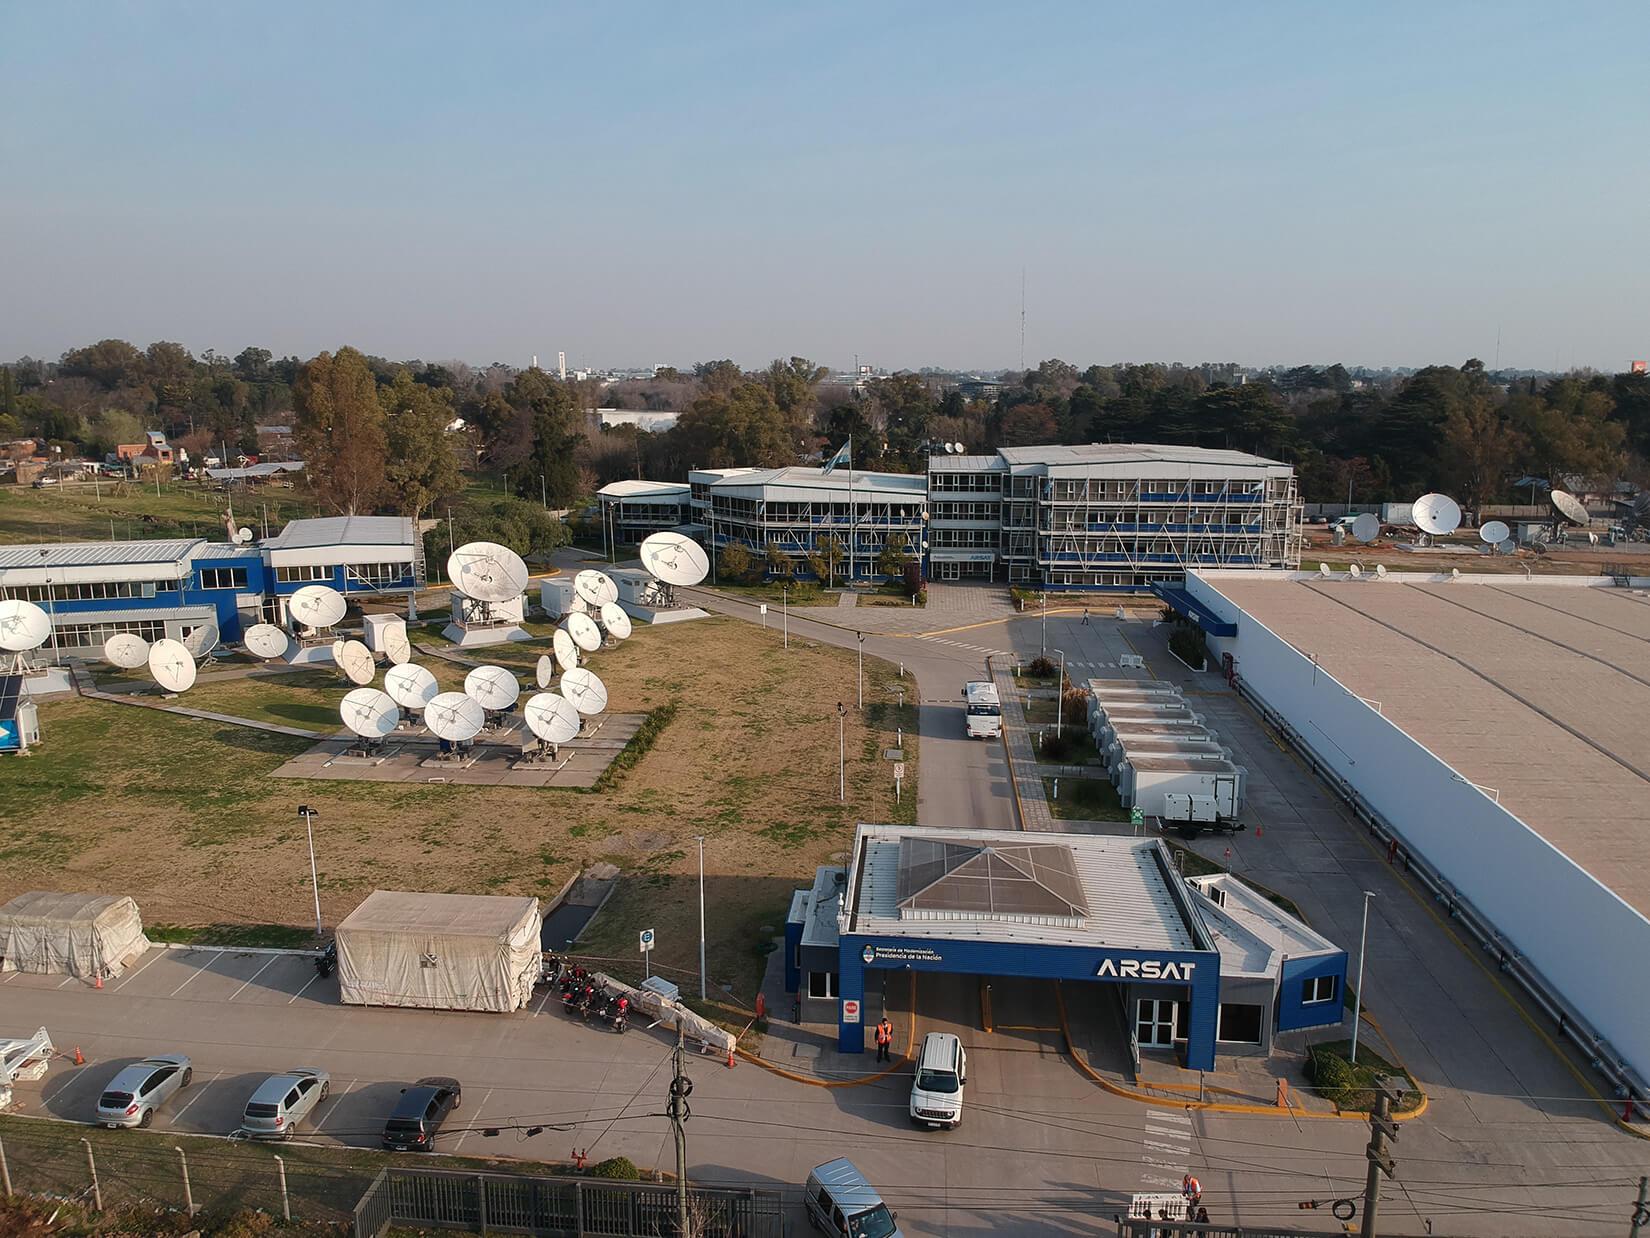 Vista desde dron, Estación Terrena de Benavídez. Entrada de edificios administrativos, técnico, Datacenter y antenas parabólicas satelitales.